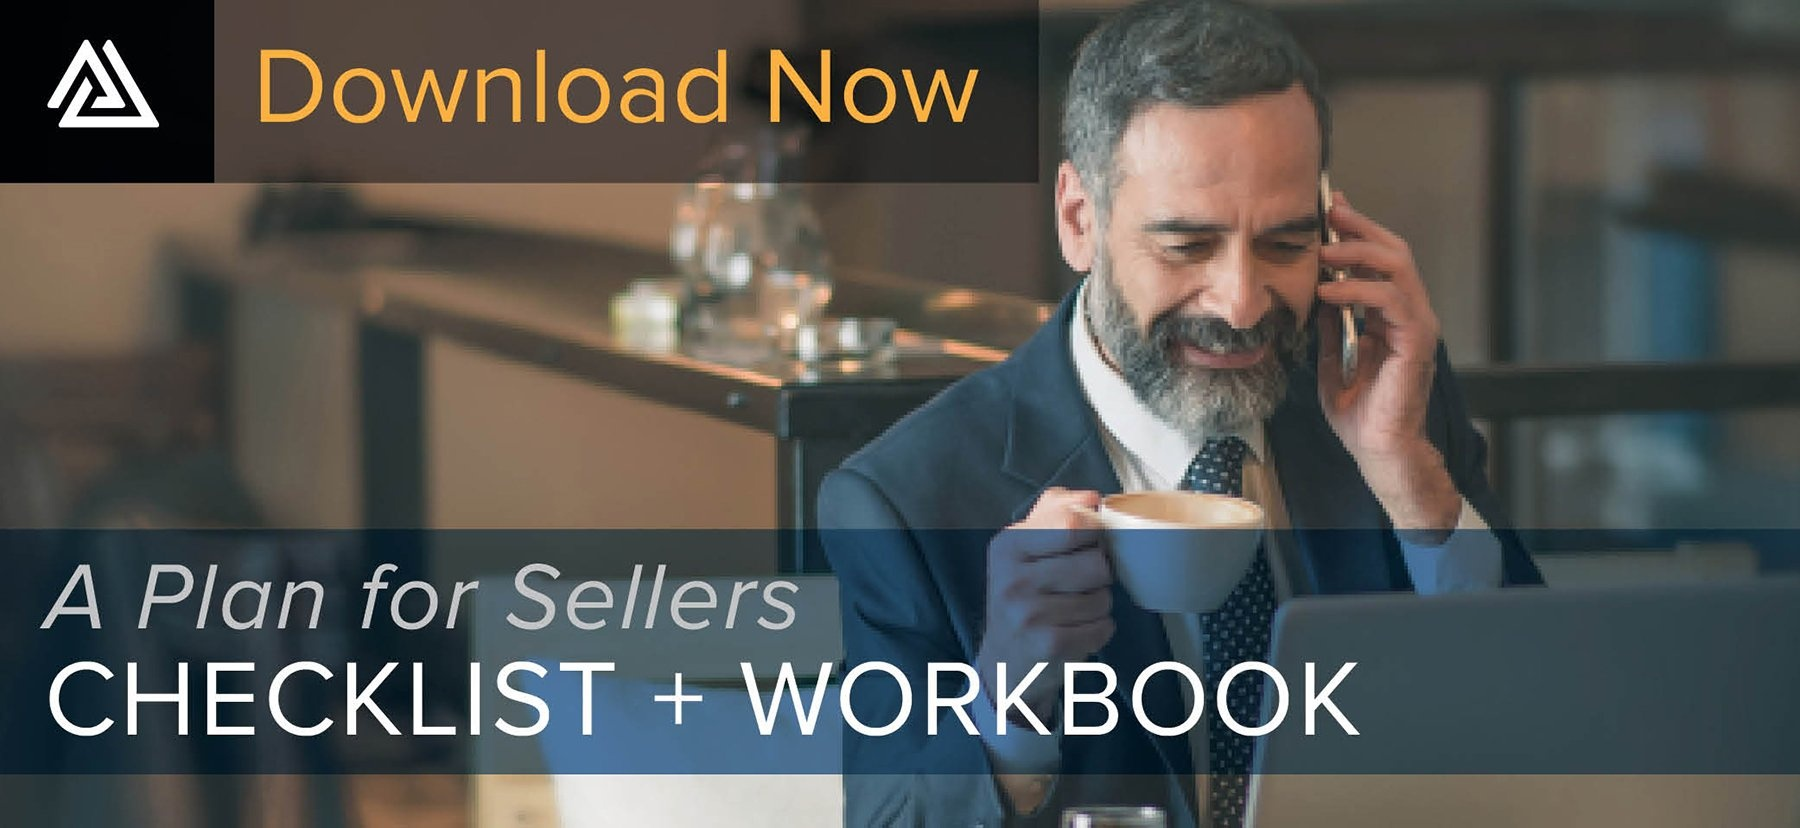 DOWNLOAD: Plan for Sellers Checklist + Workbook